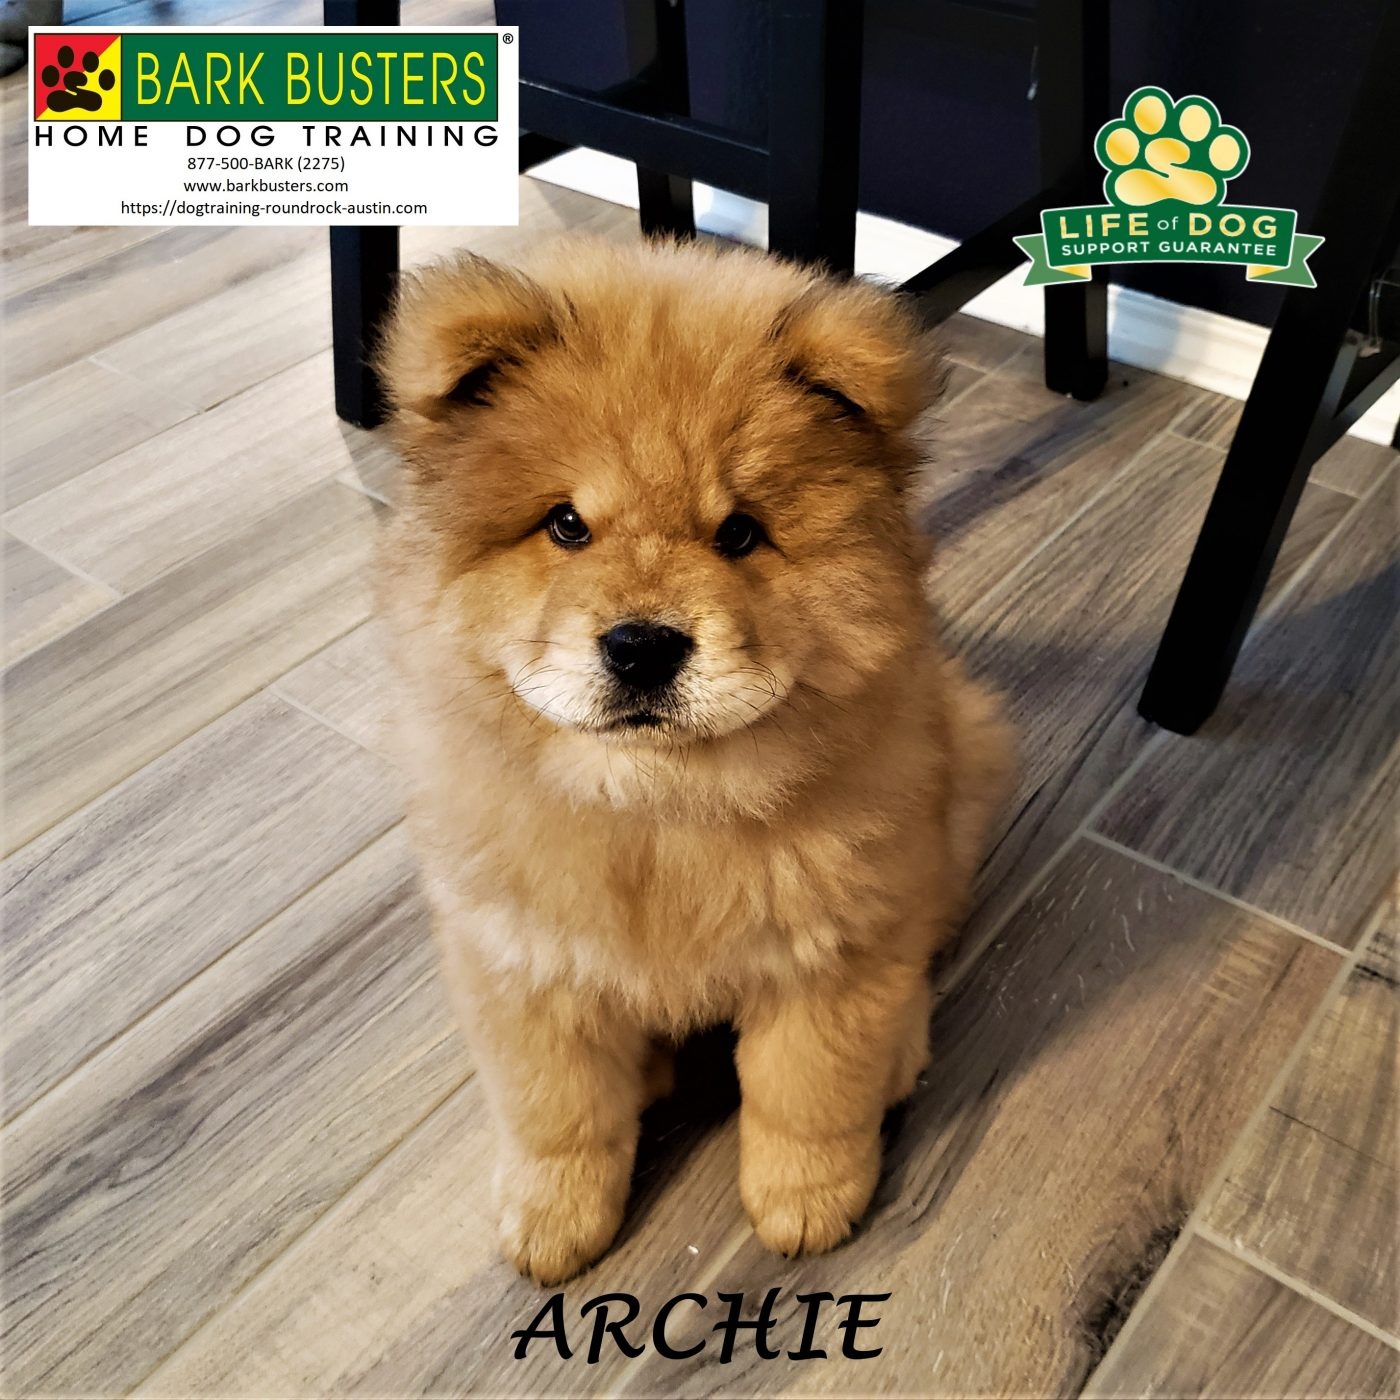 #chow #chowchow #puppytraining #dogtrainingroundrock #dogtrainernearme #barkbusters #inhomedogtraining